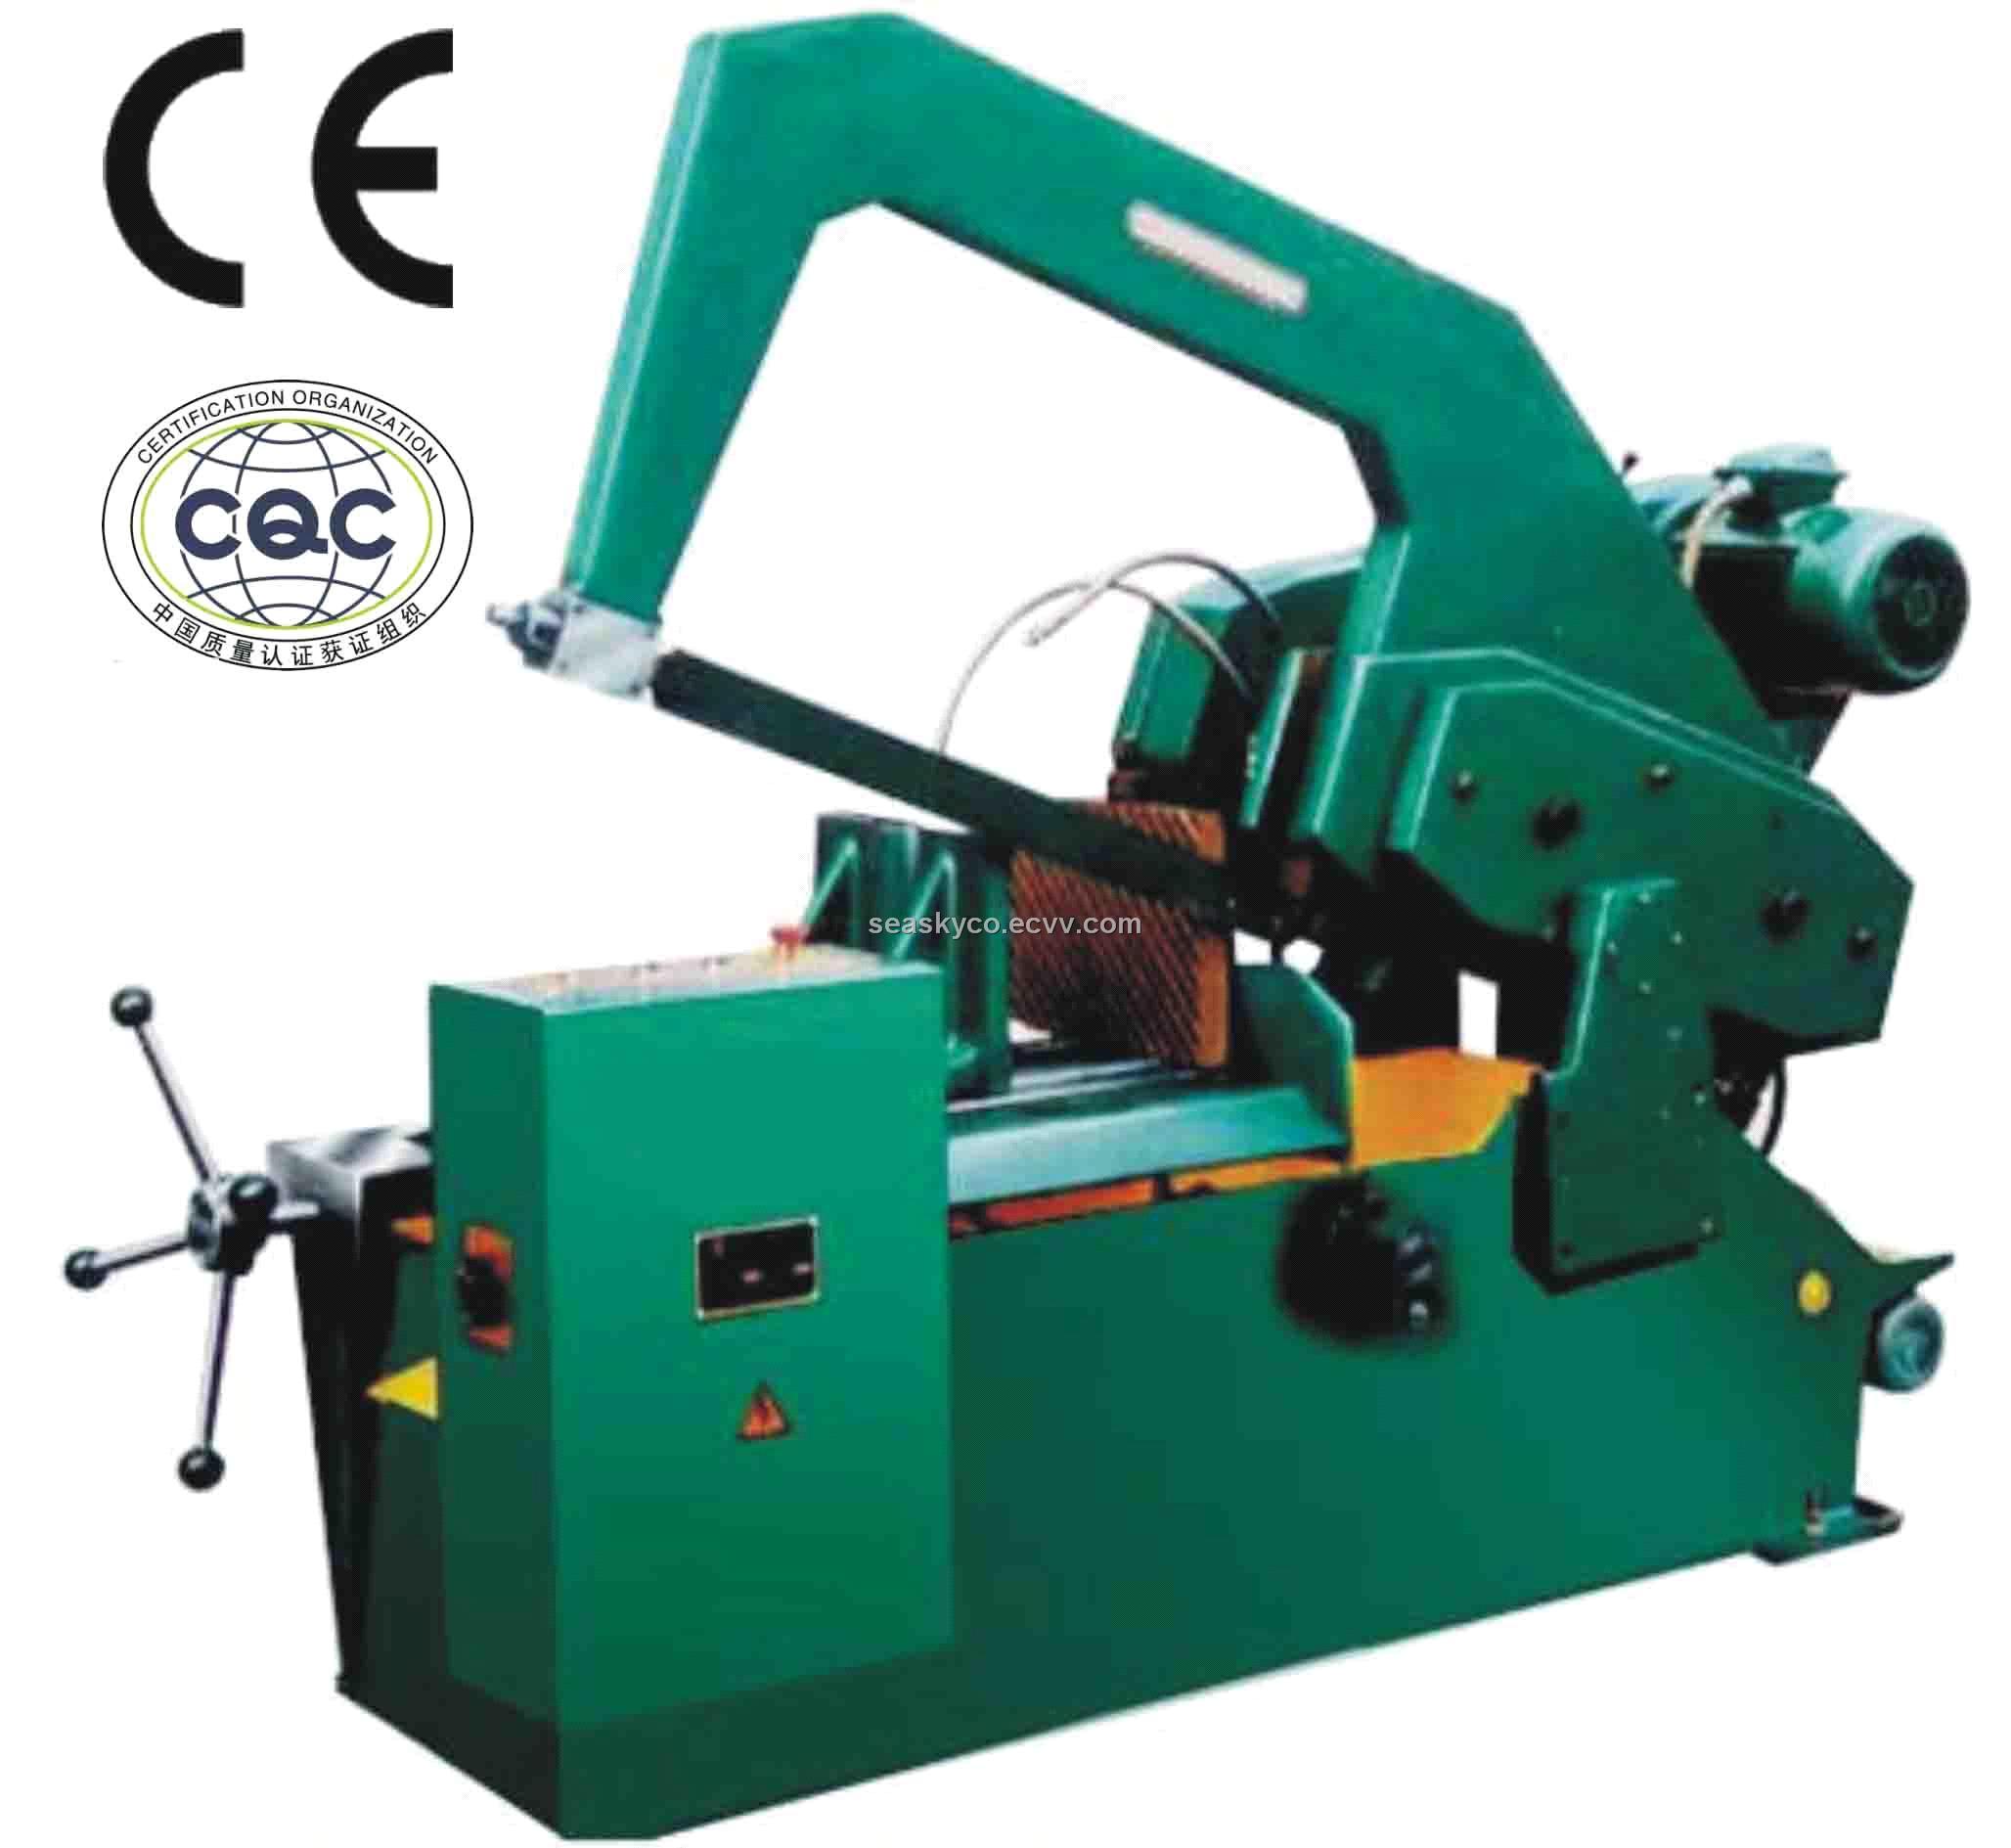 Power Hacksaw Machine (PH-7132) purchasing, souring agent | ECVV.com ...